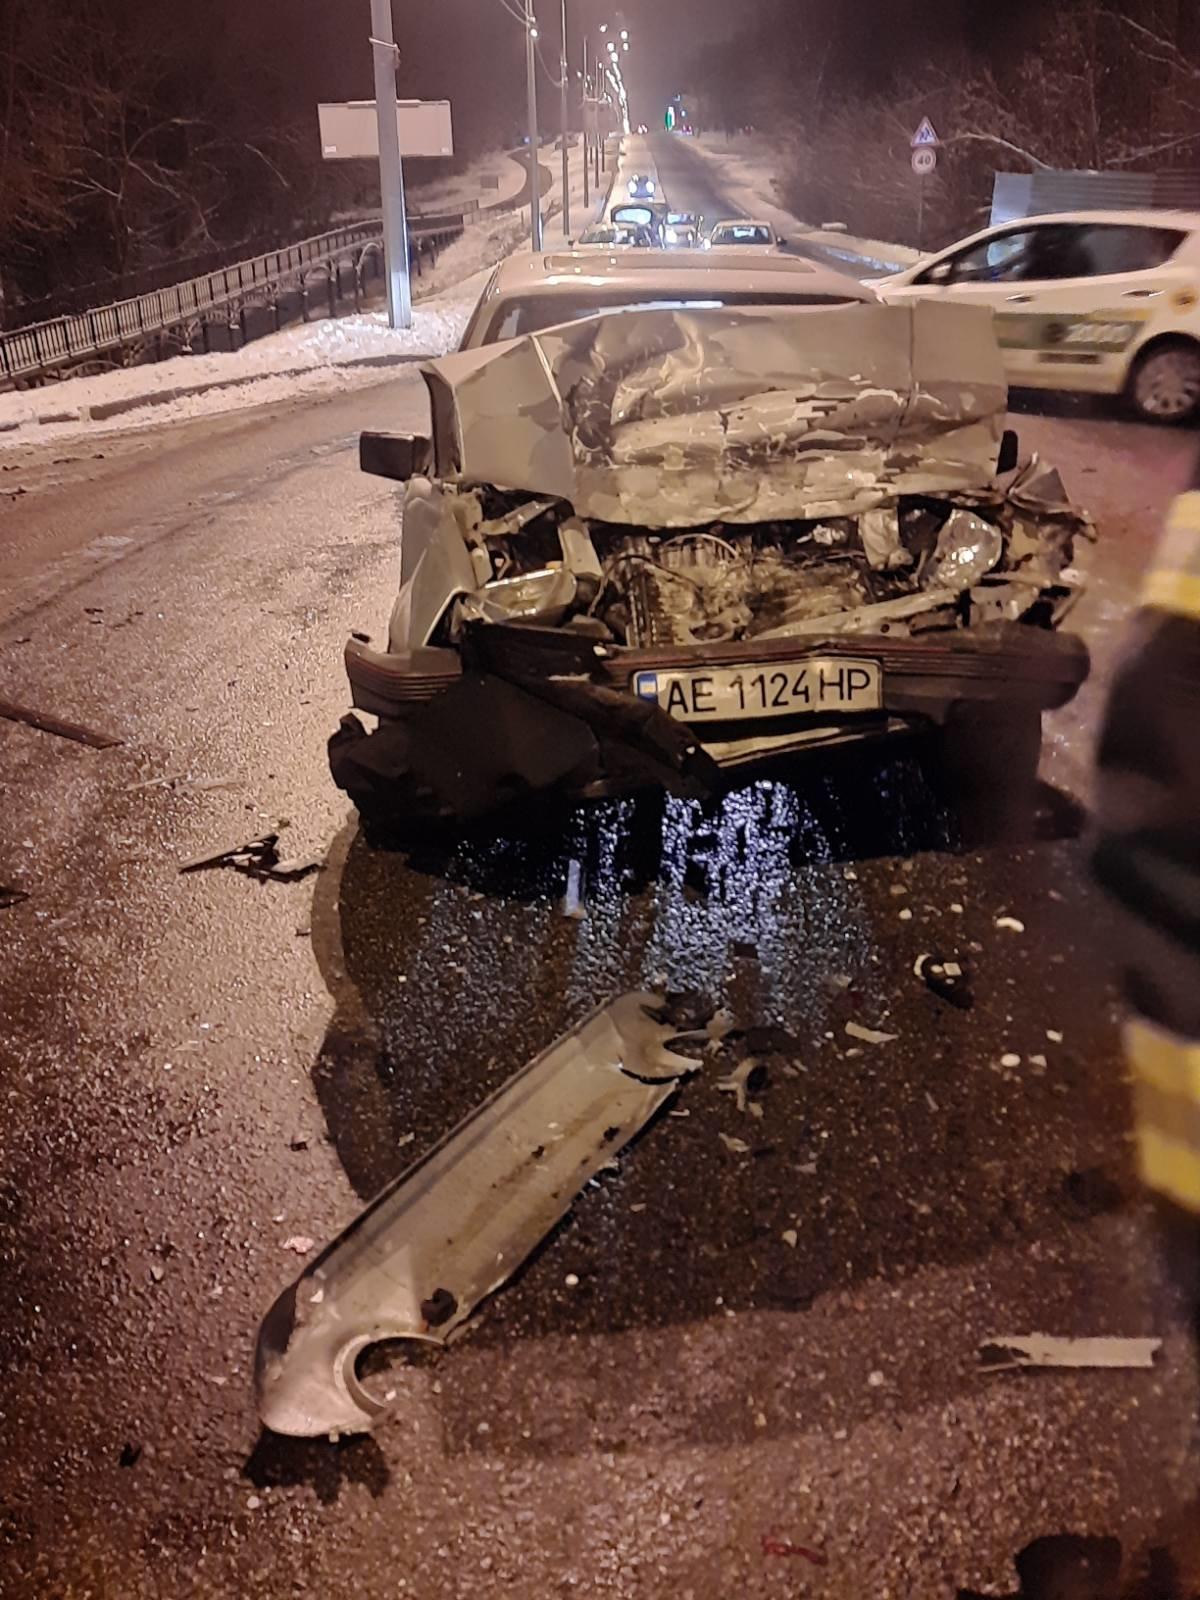 На трассе в Харькове спасатели вытащили авто, слетевшее в кювет, - ФОТО, фото-1